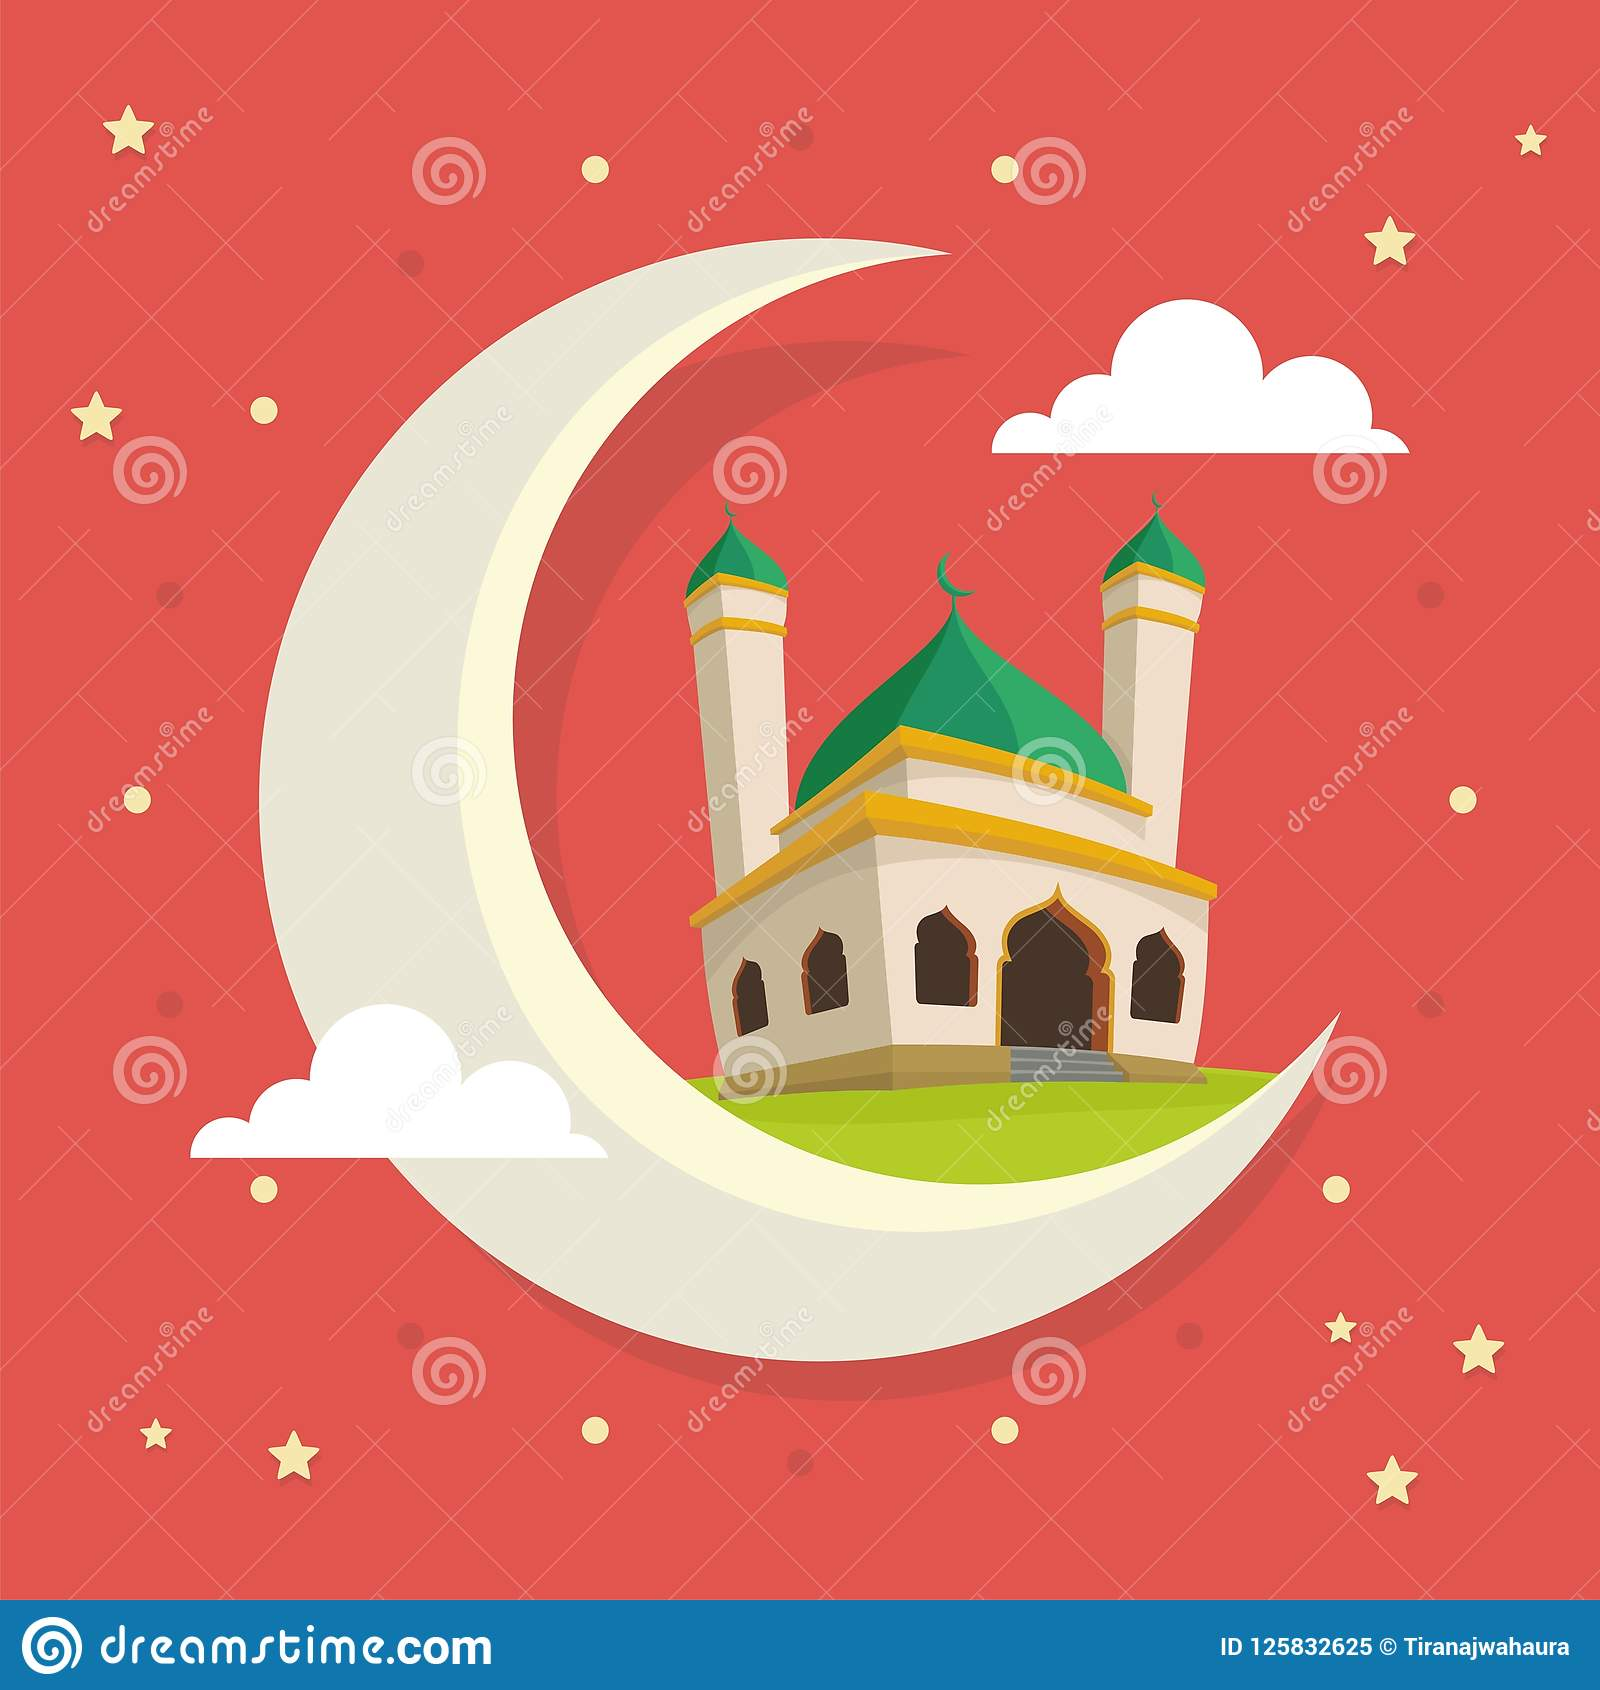 Ramadan Greeting Card con la mezquita de la historieta en la luna